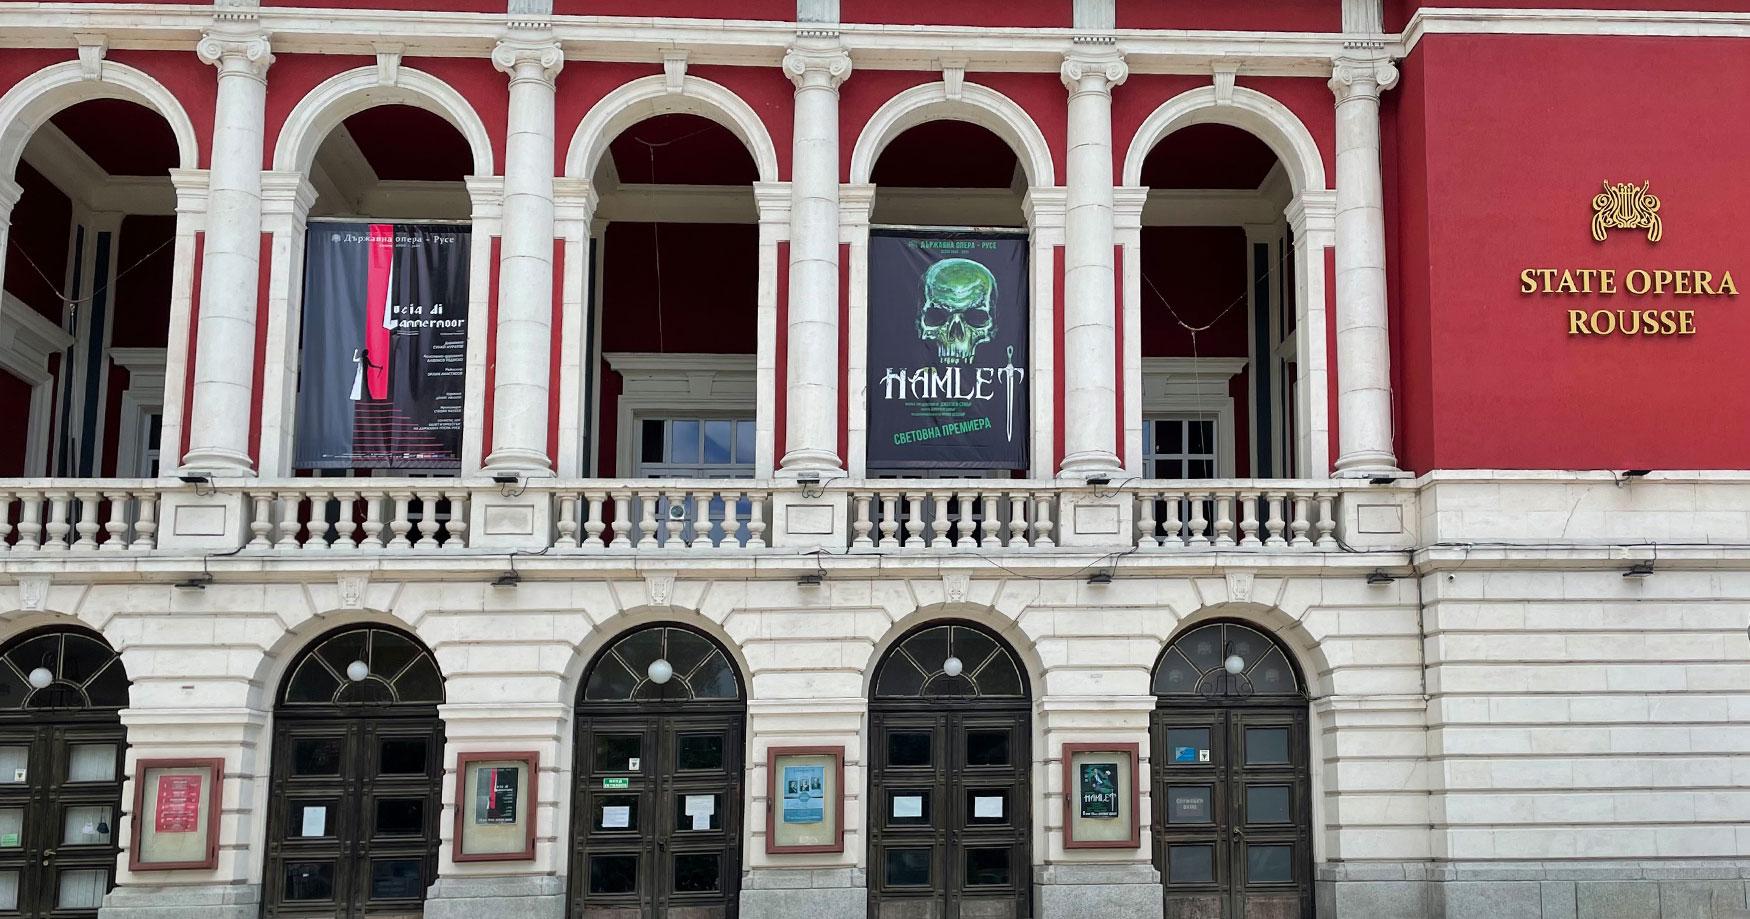 Russe Opera House